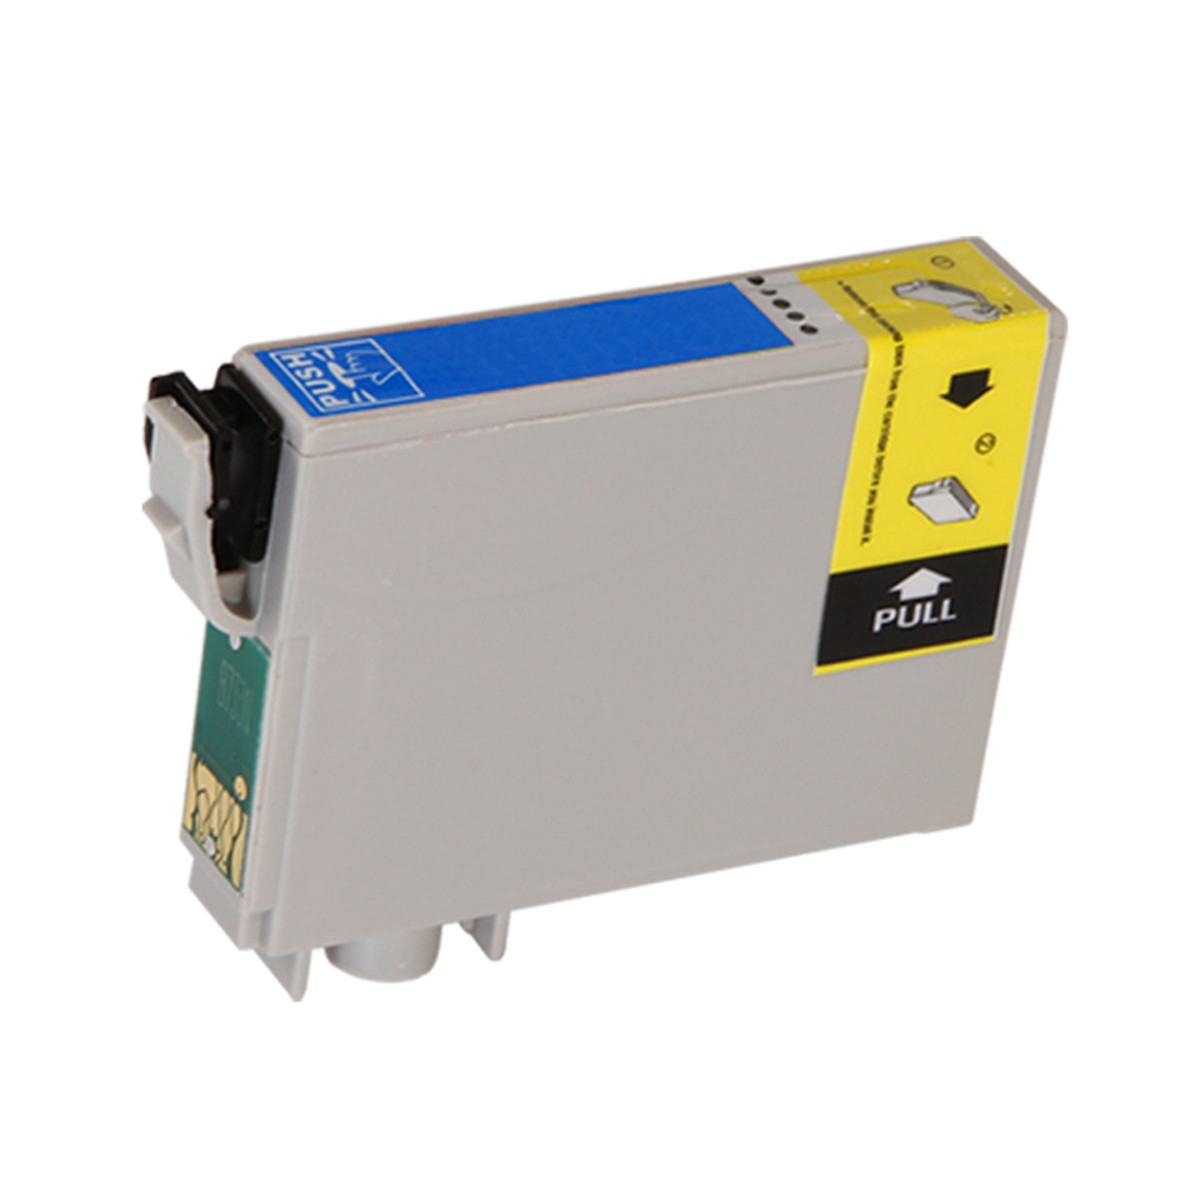 Cartucho de Tinta Compatível com Epson T082220 T082 T0822 Ciano | R290 R270 R390 RX590 T50 | 12ml